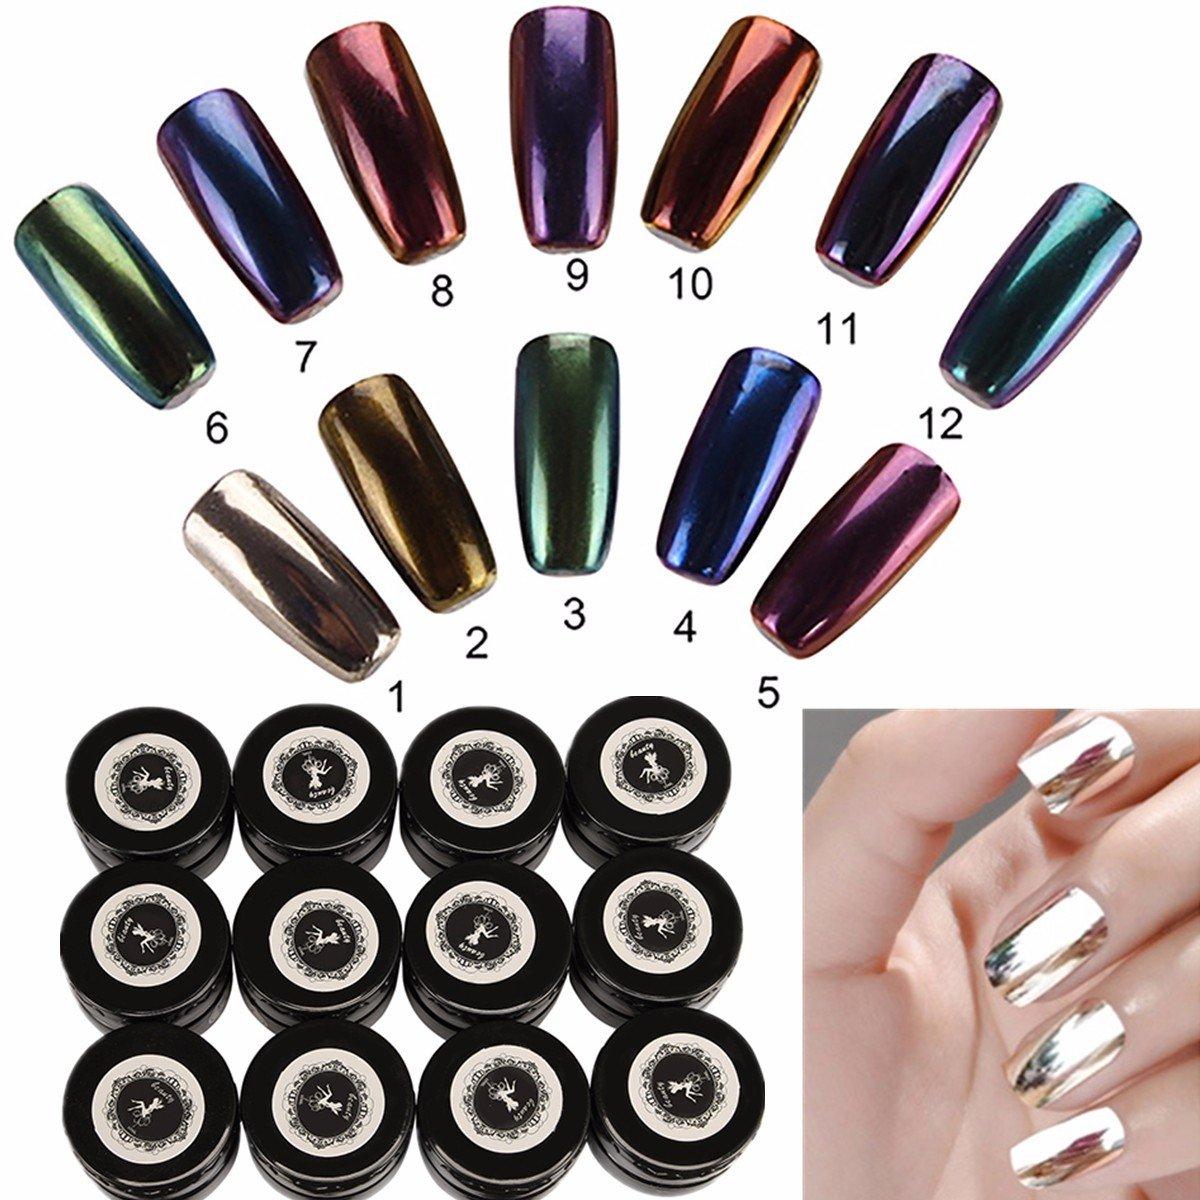 Chrome Nail Powder Mirror DANCINGNAIL 12 Colors 12 bottles Nail ...